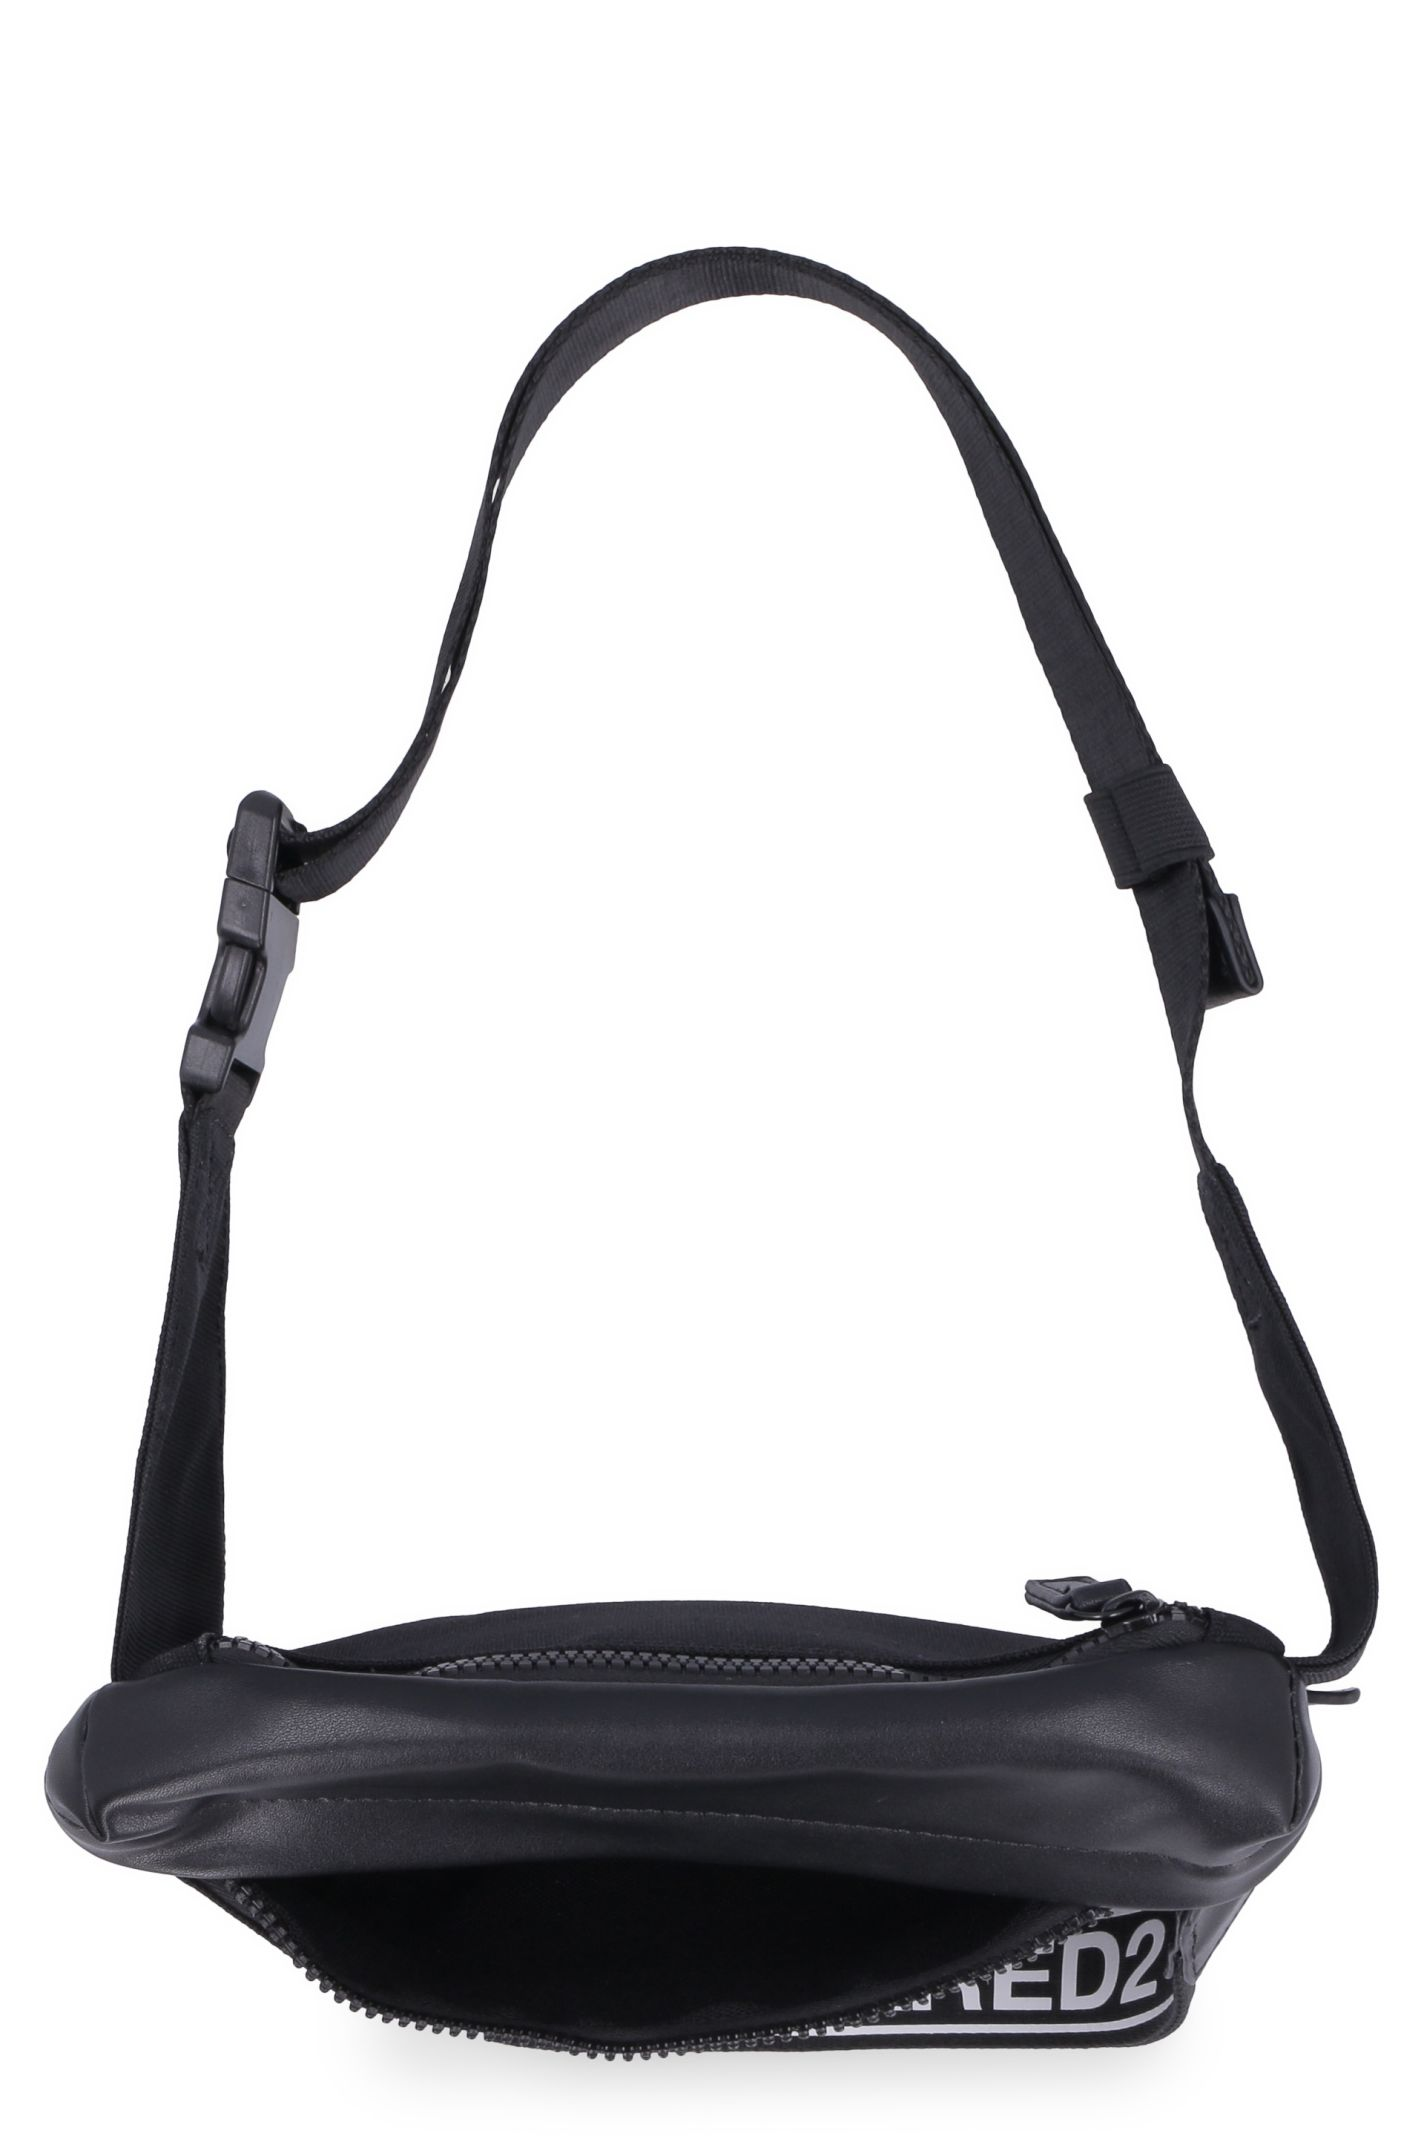 61b232956cd Dsquared2 Dsquared2 Nylon Belt Bag With Leather Details - black ...